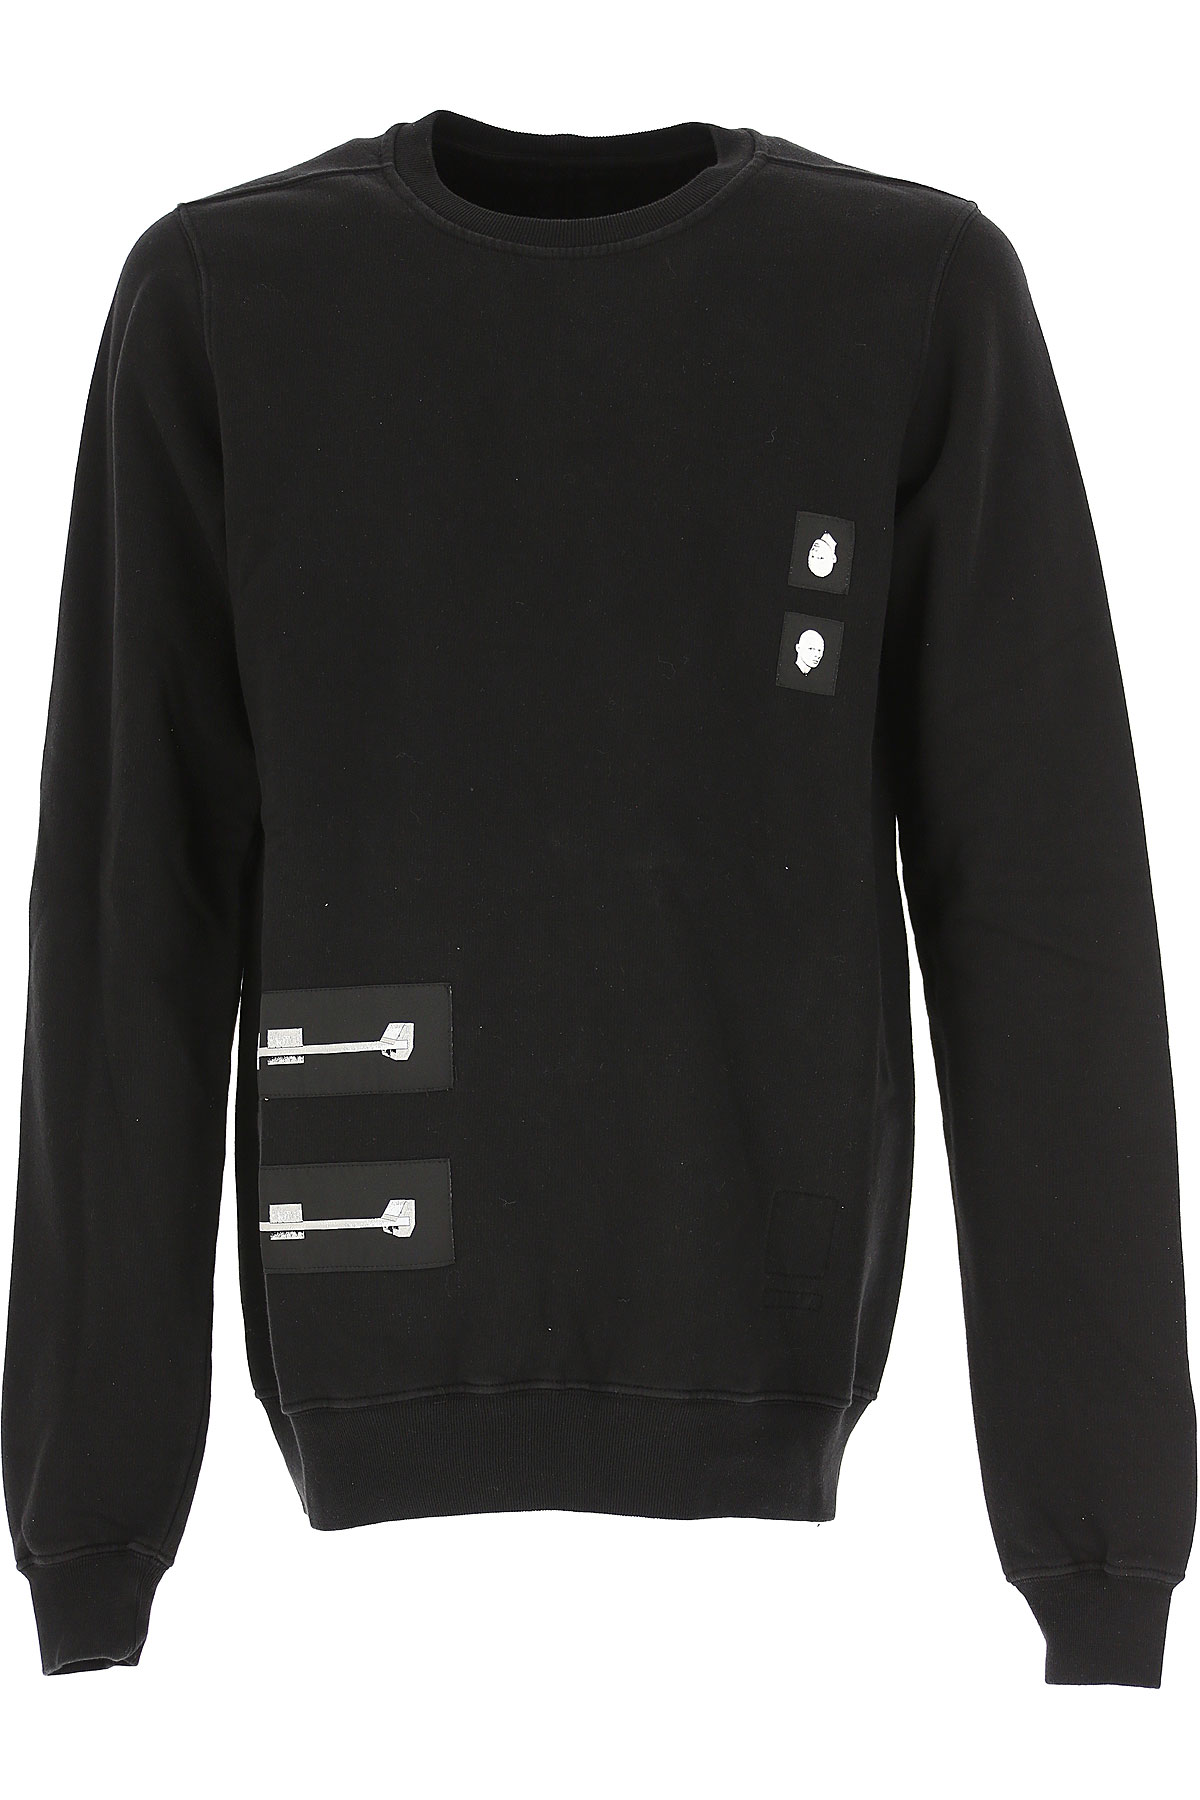 Rick Owens Sweatshirt for Men On Sale in Outlet, Black, Cotton, 2019, M S